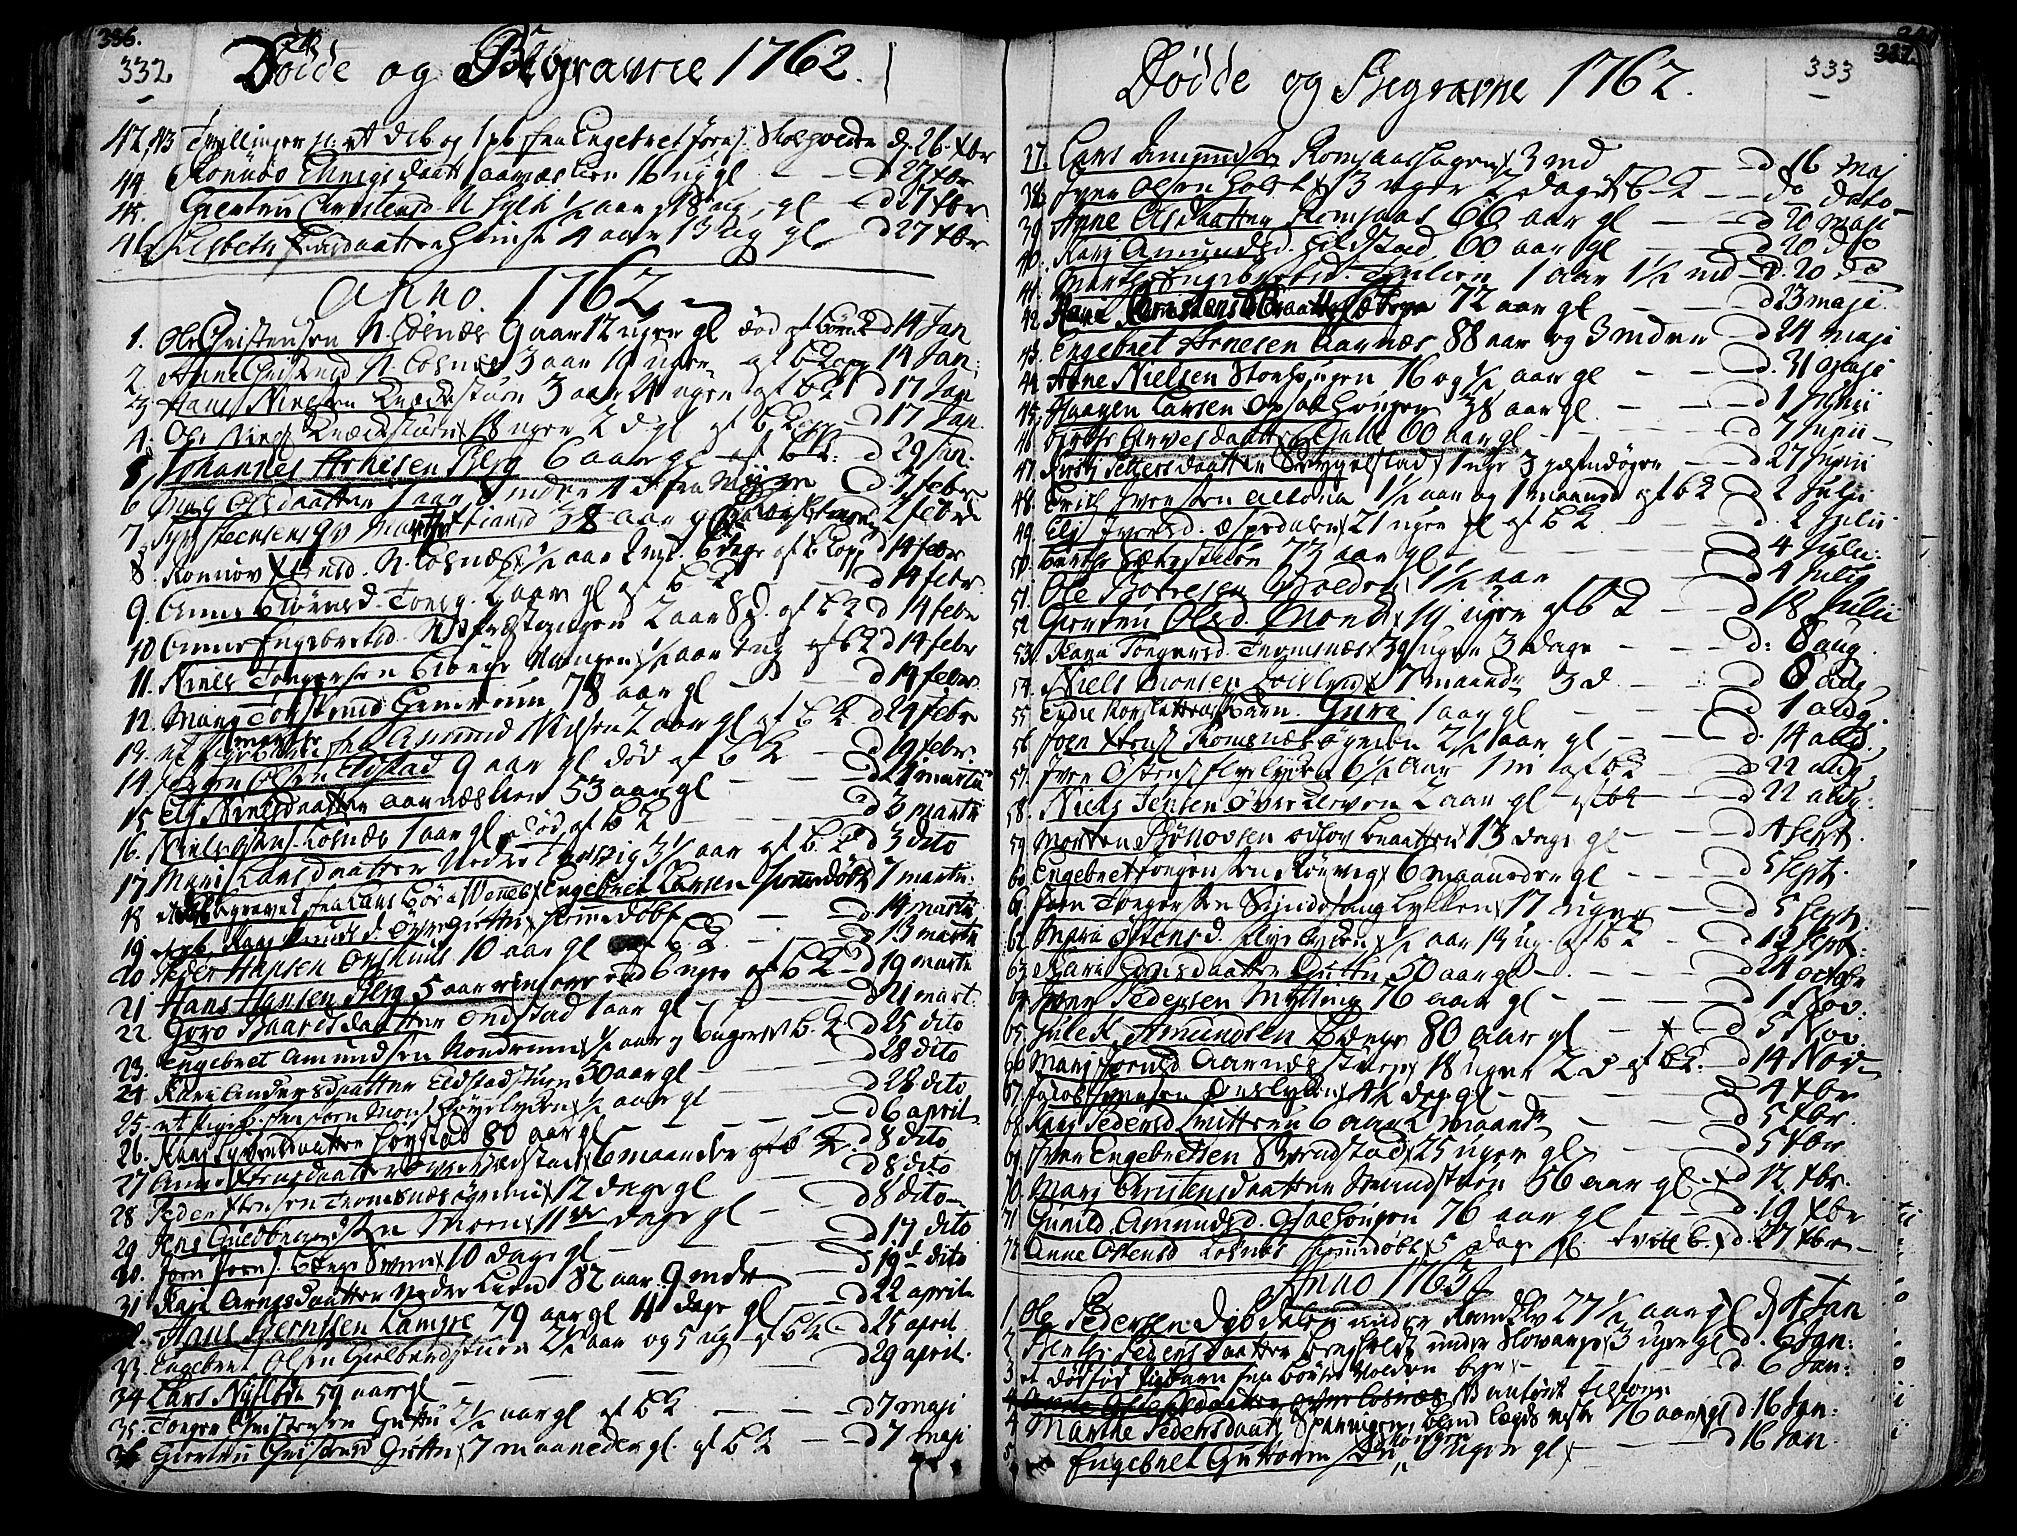 SAH, Ringebu prestekontor, Ministerialbok nr. 2, 1734-1780, s. 332-333